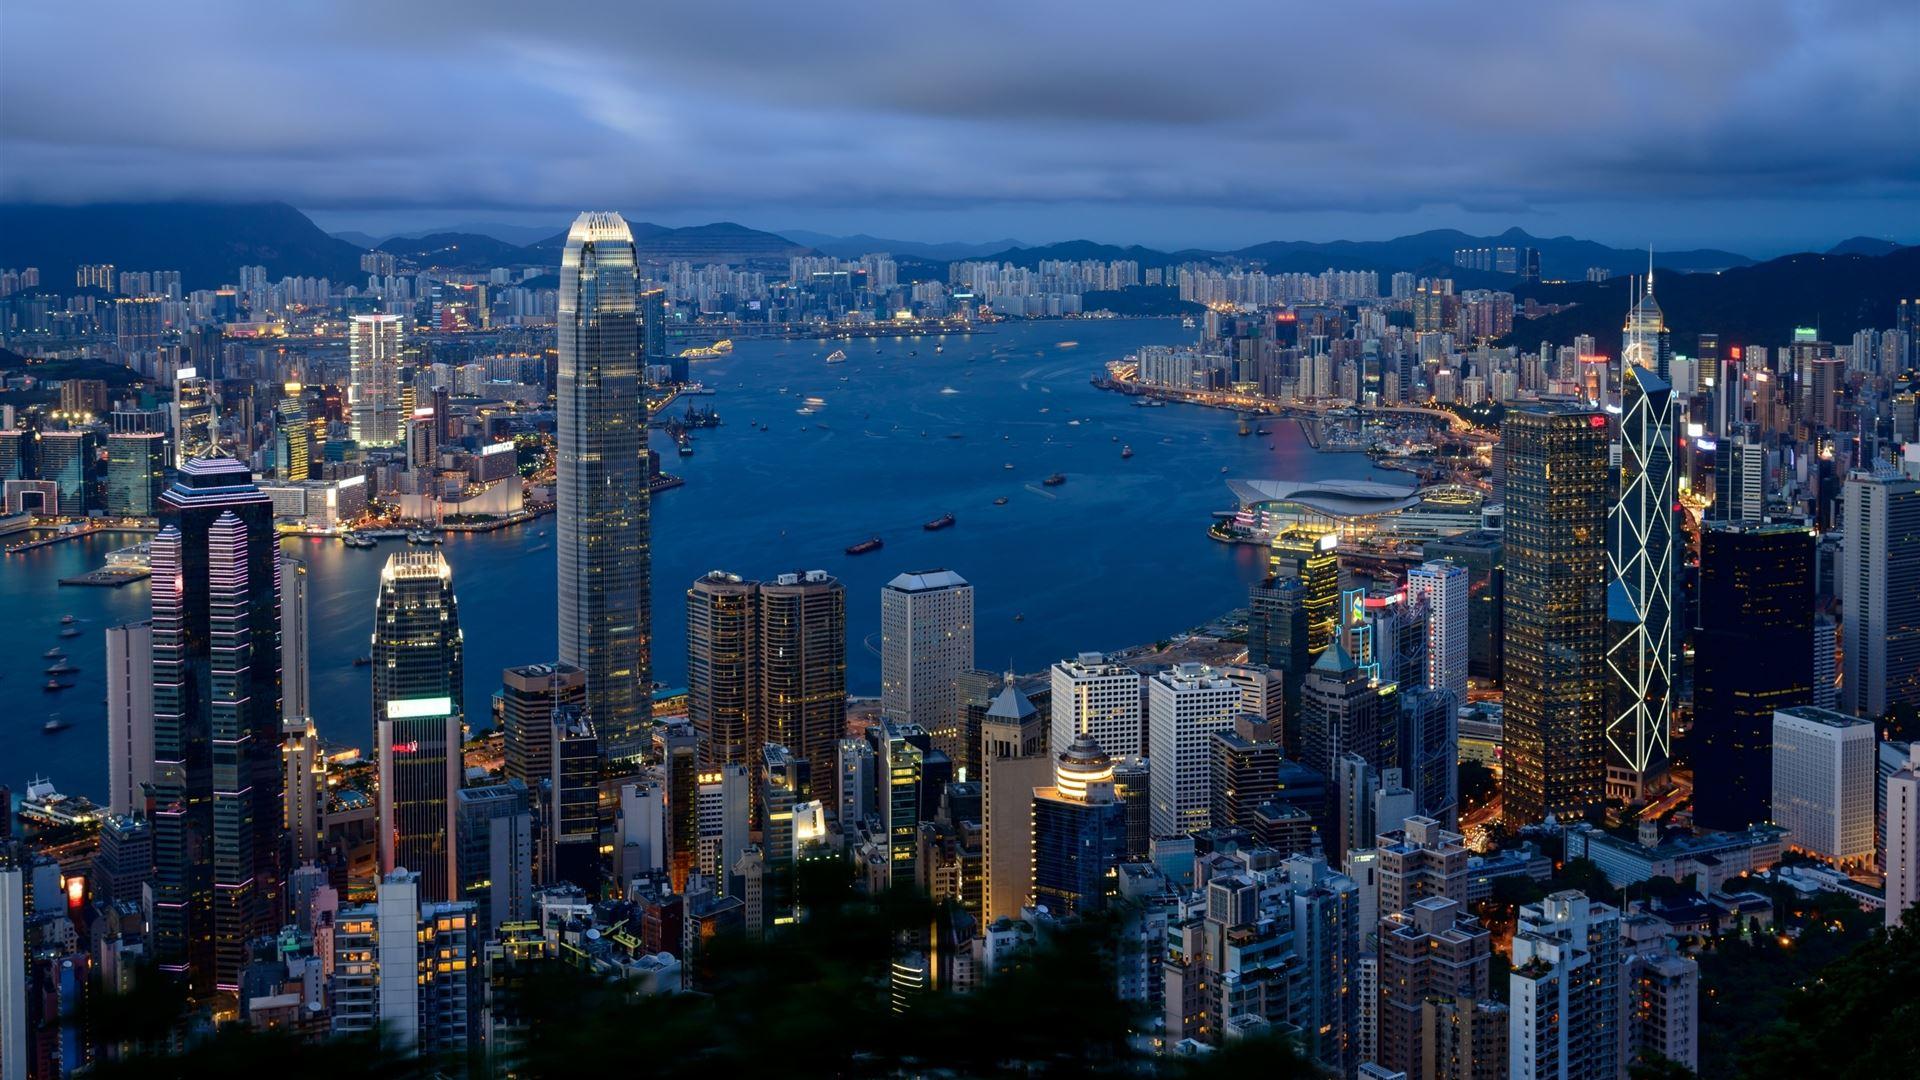 Hong Kong City View Mac Wallpaper Download | Free Mac ...